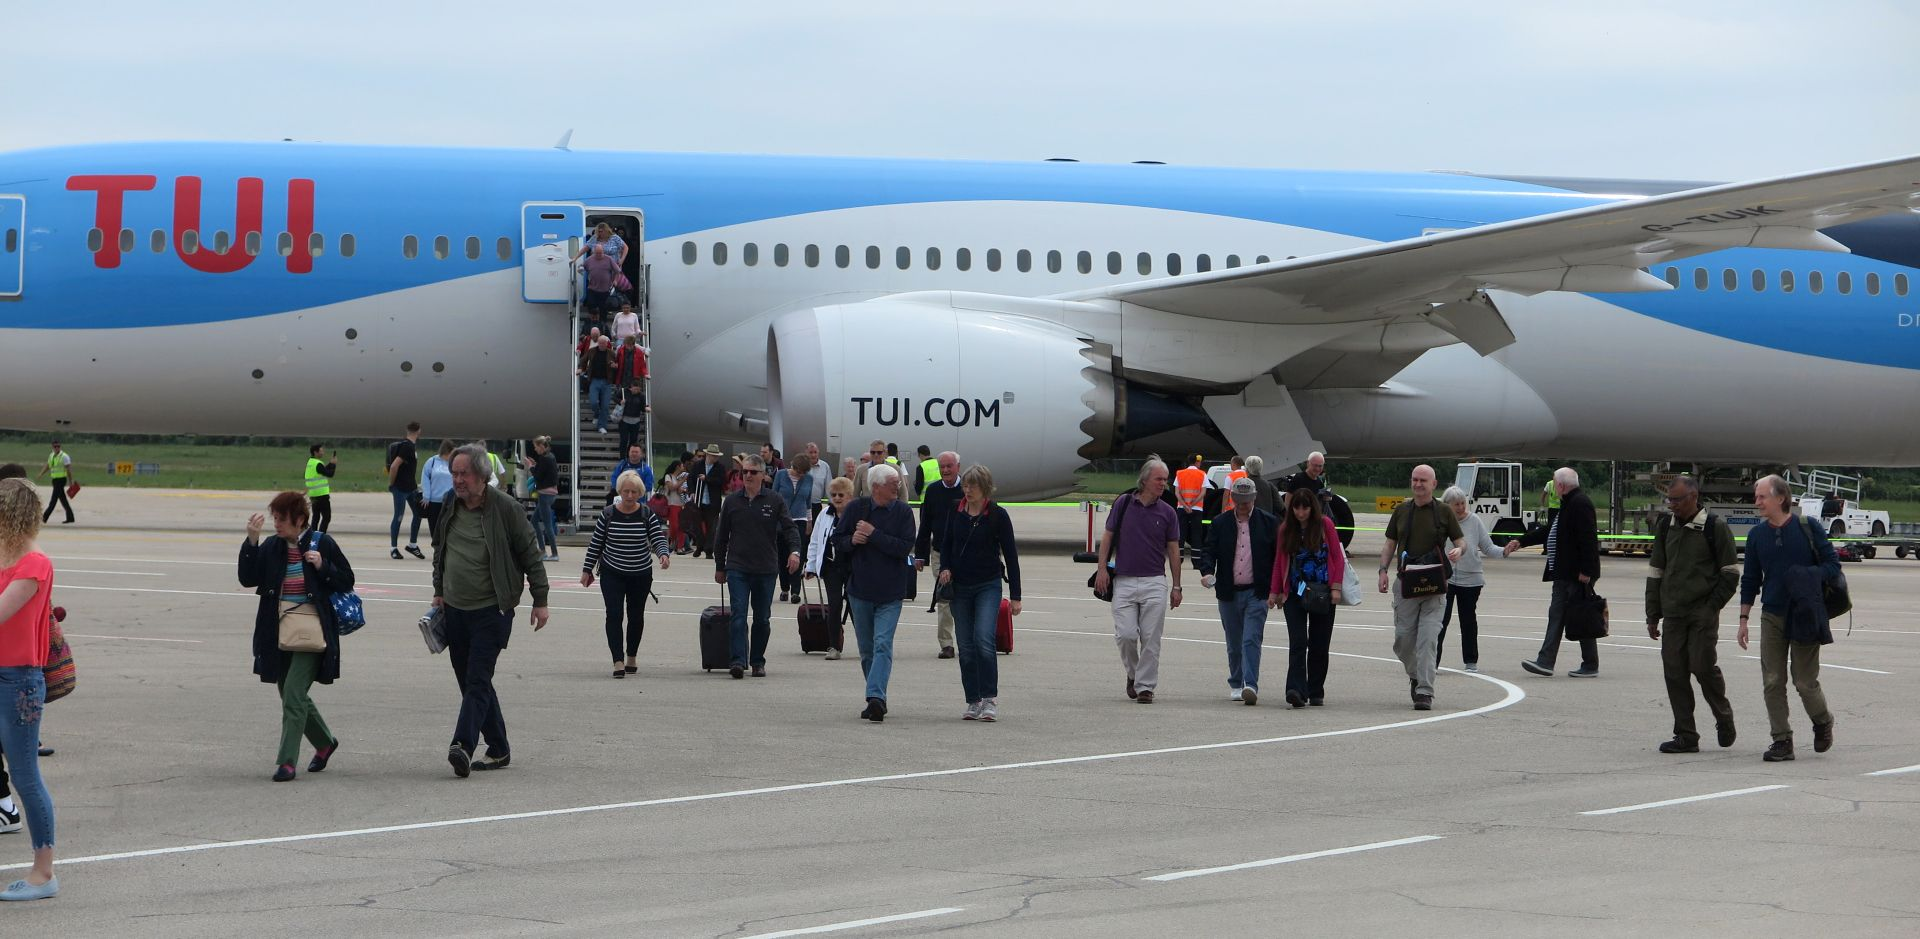 U Pulu sletio Boeing 787-900 Dreamliner s 329 putnika